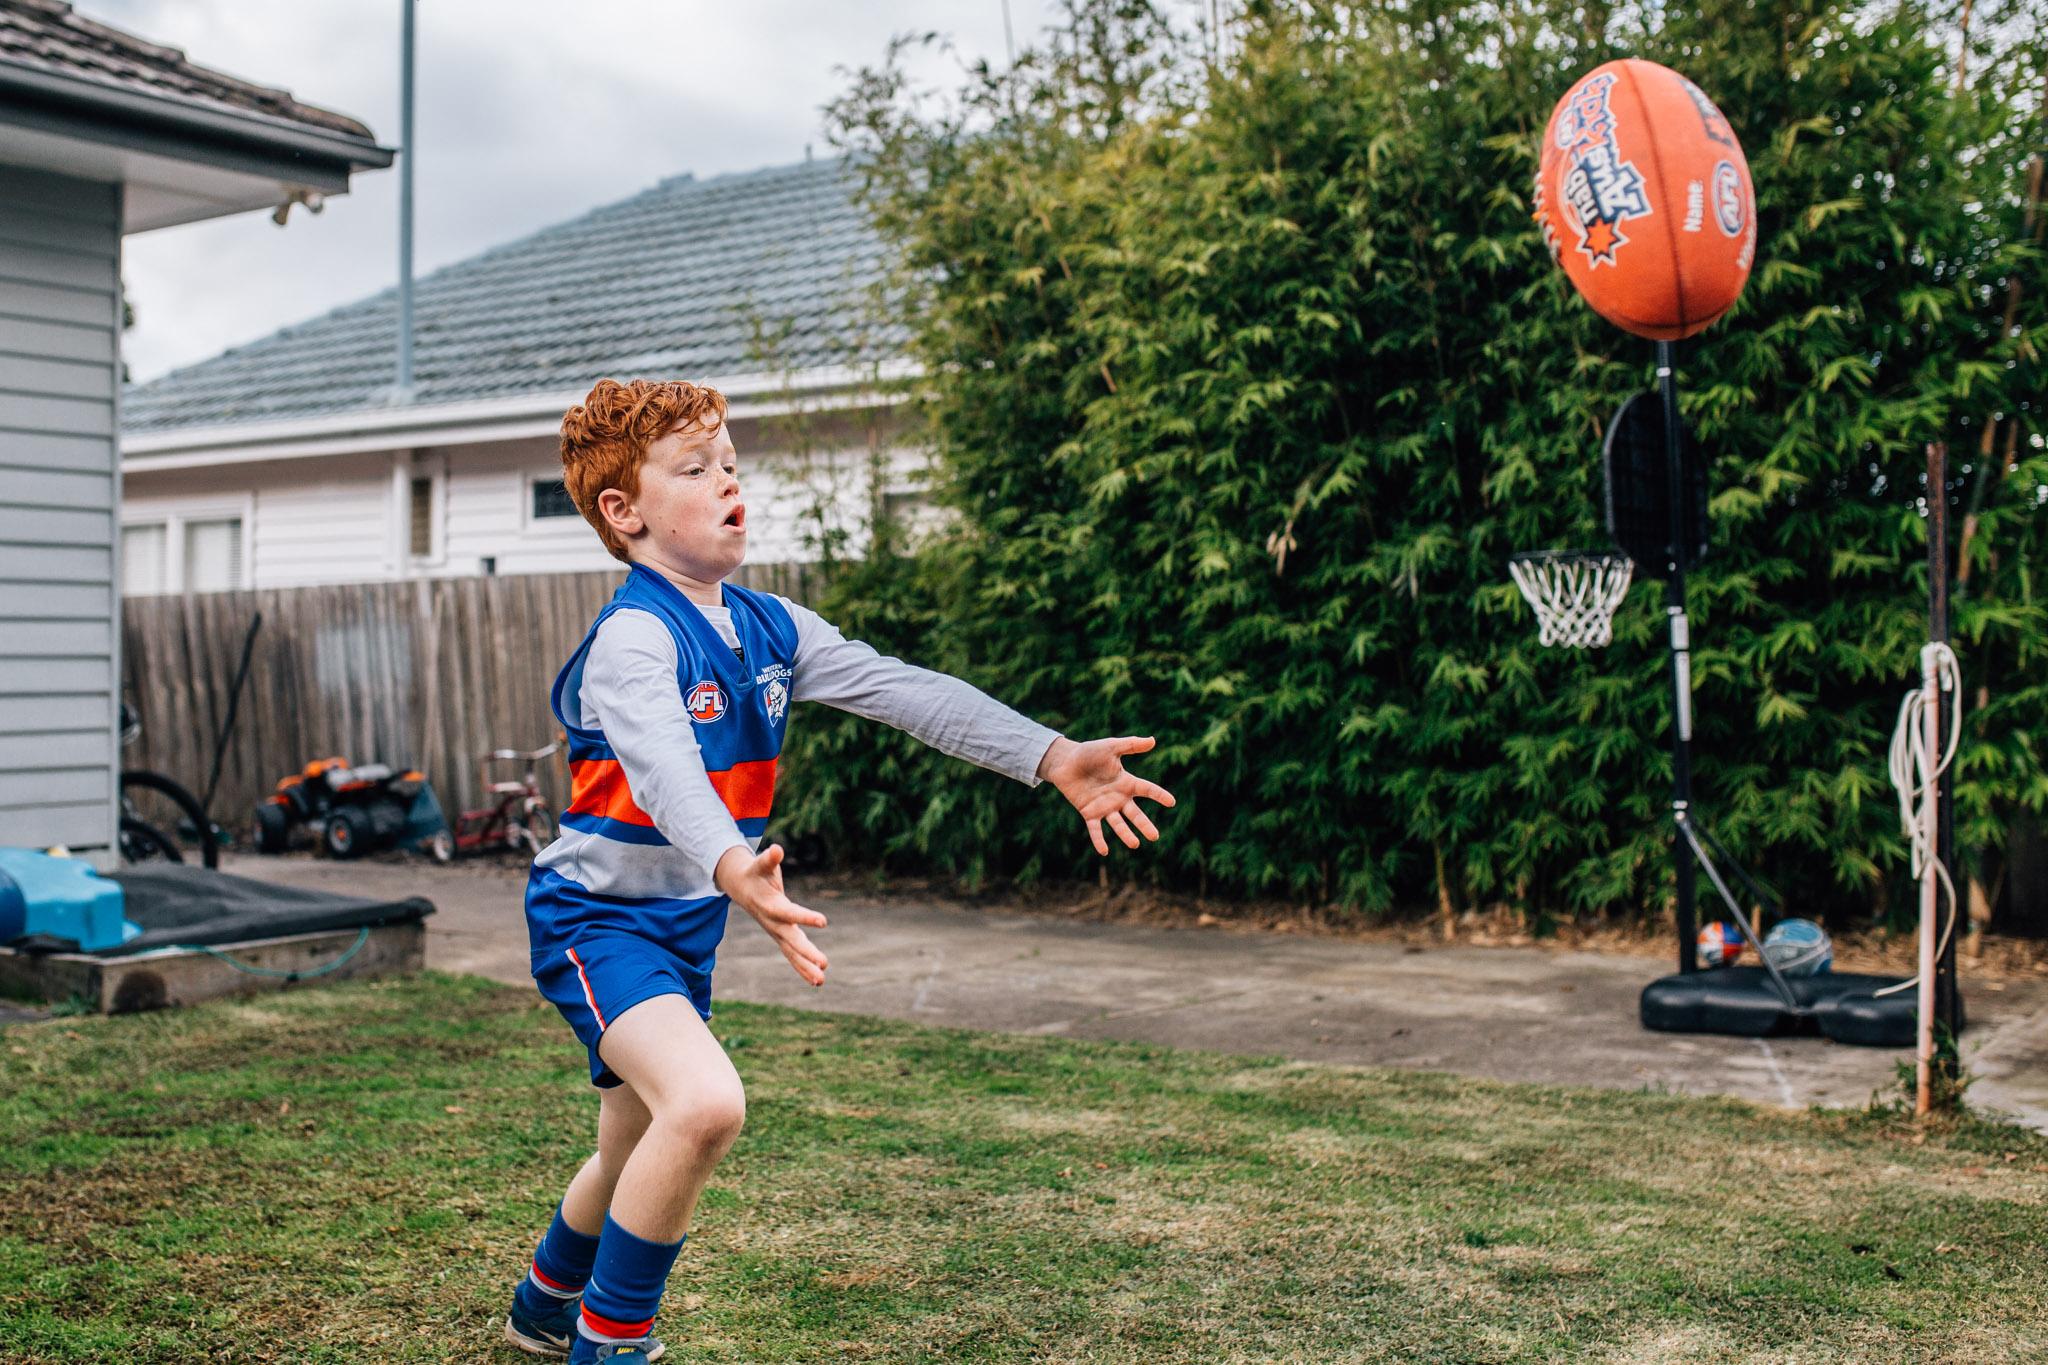 Boy catching football.